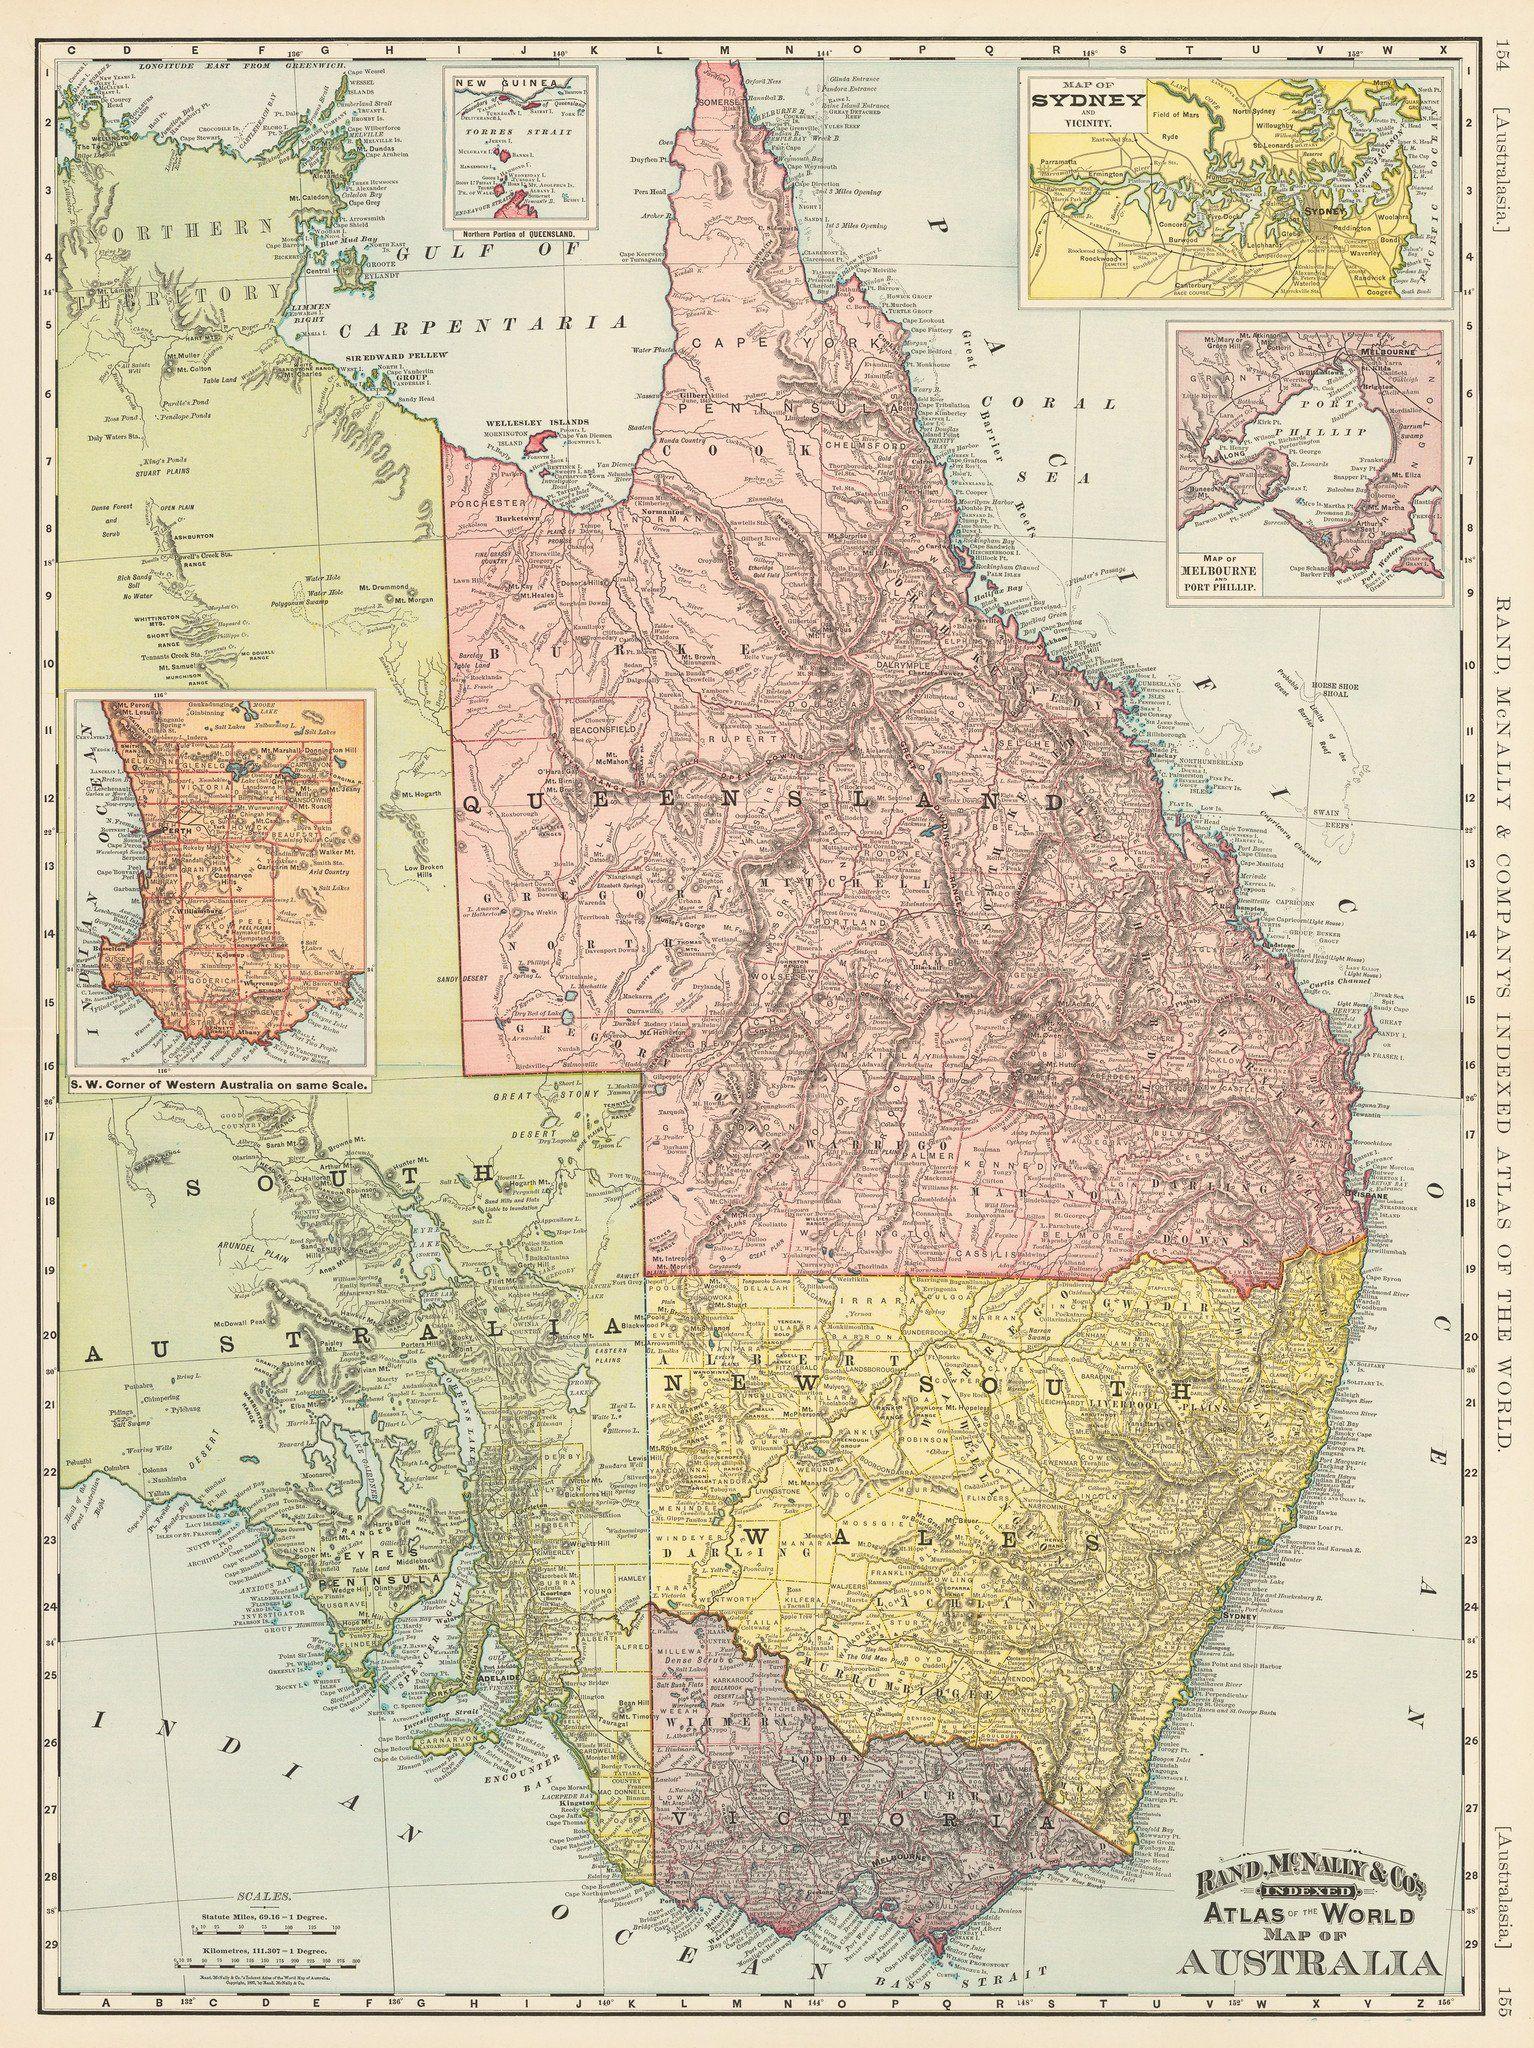 1892 rand mcnally cos indexed atlas of the world map of indexed atlas of the world map of australia gumiabroncs Choice Image